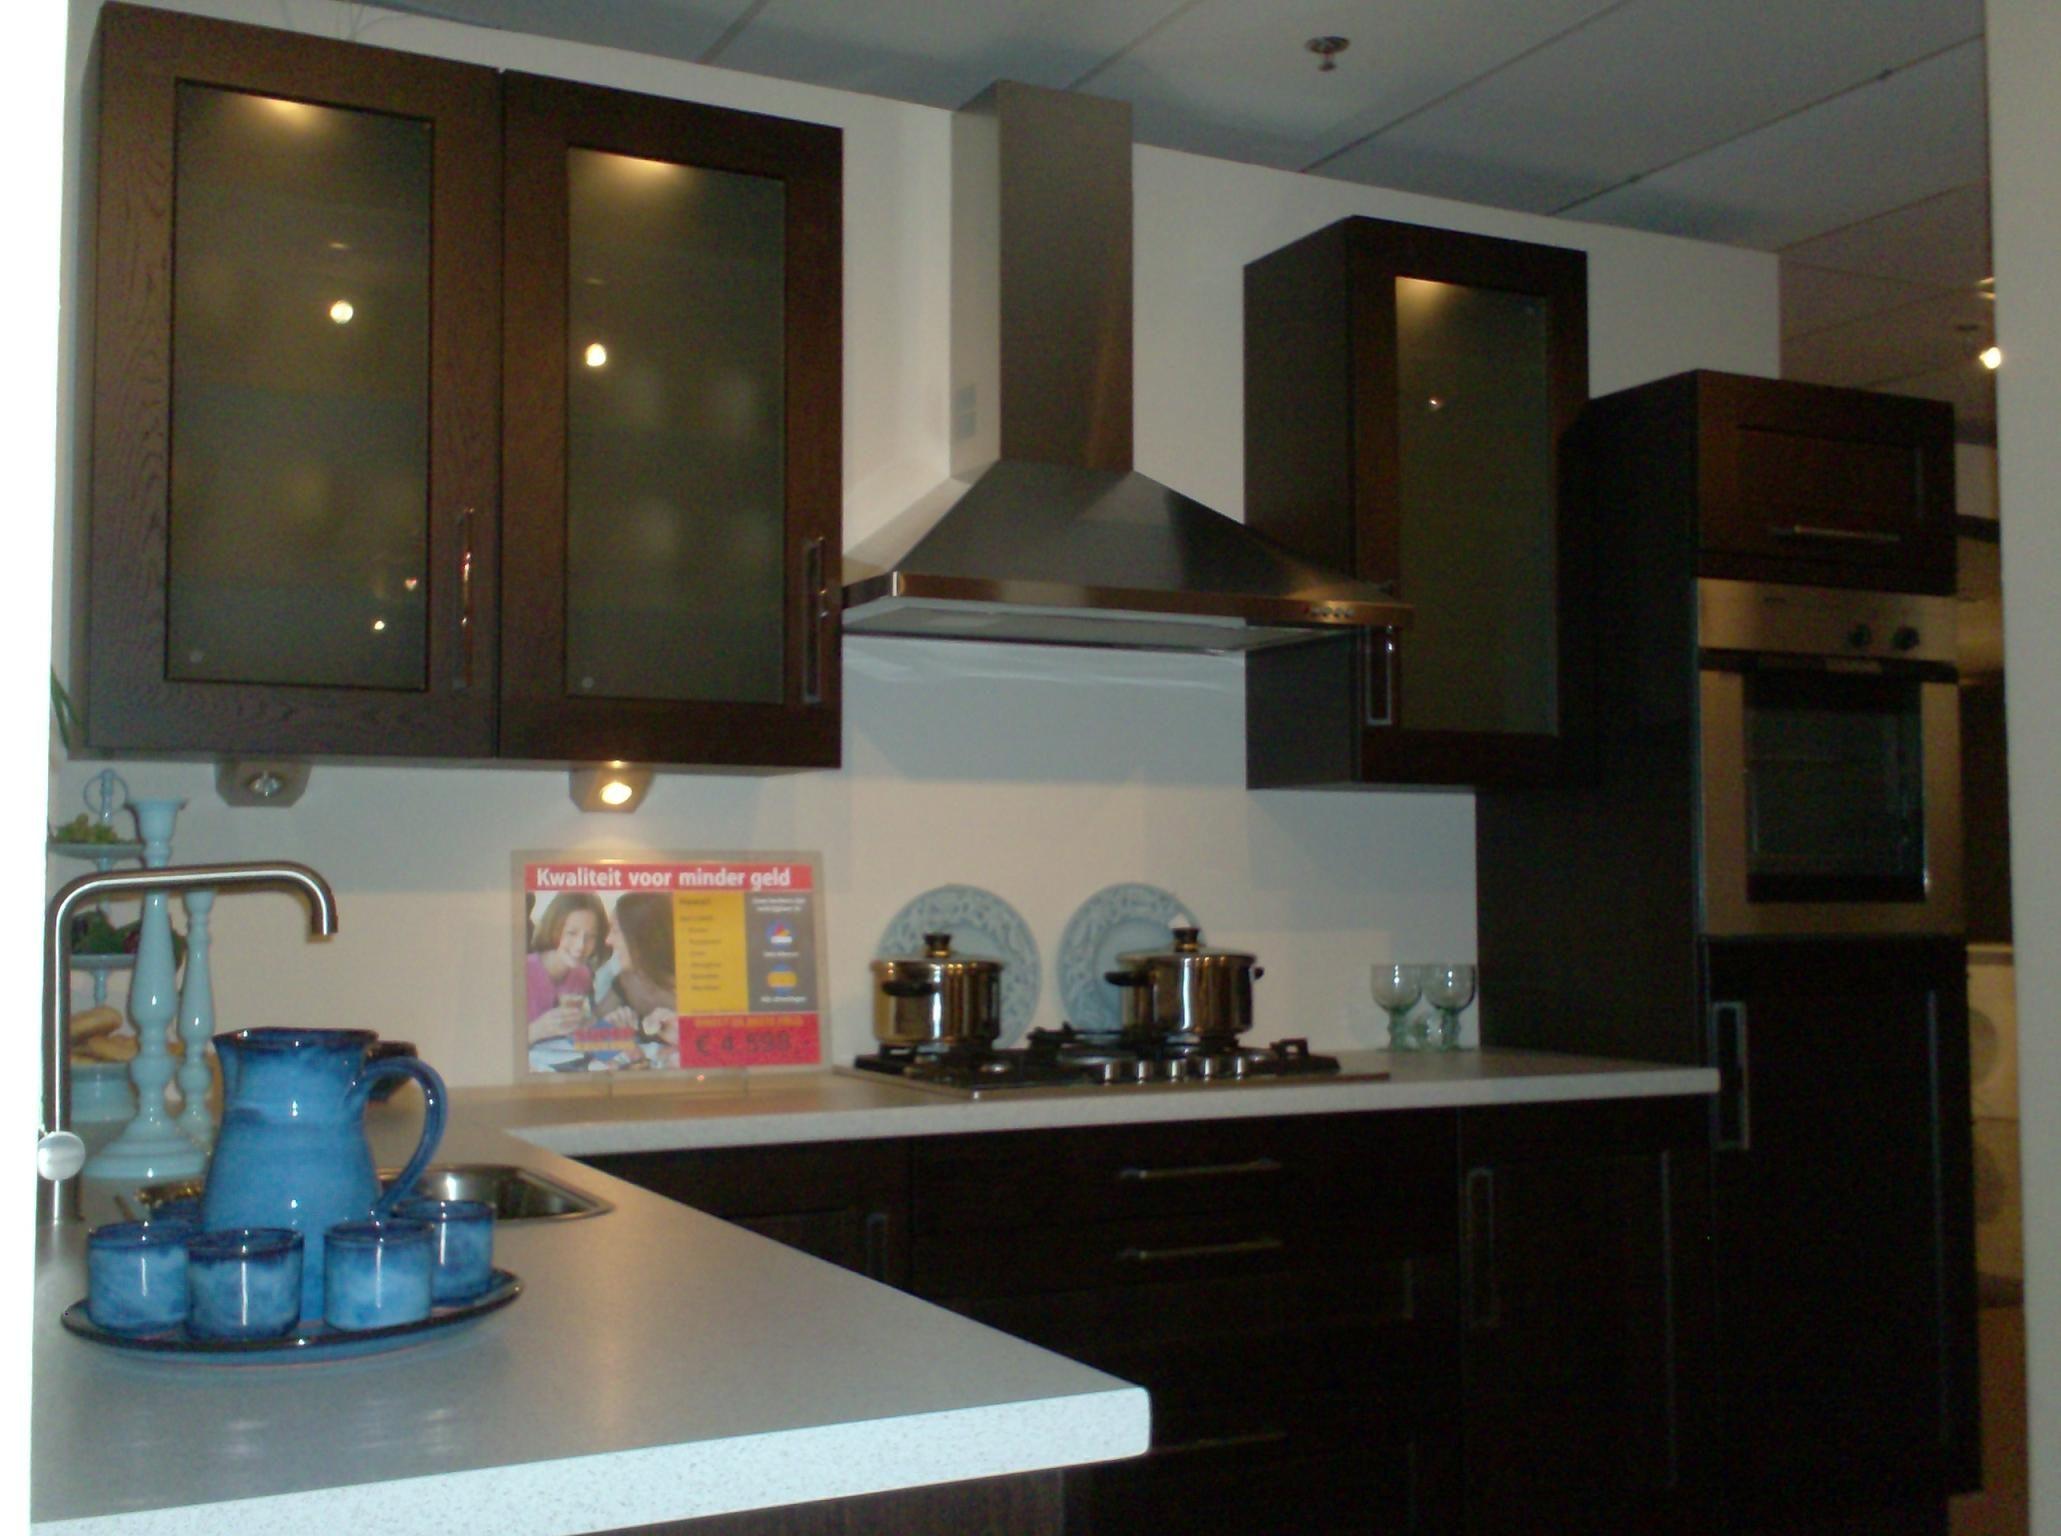 de voordeligste woonwinkel van nederland highwood 35294. Black Bedroom Furniture Sets. Home Design Ideas